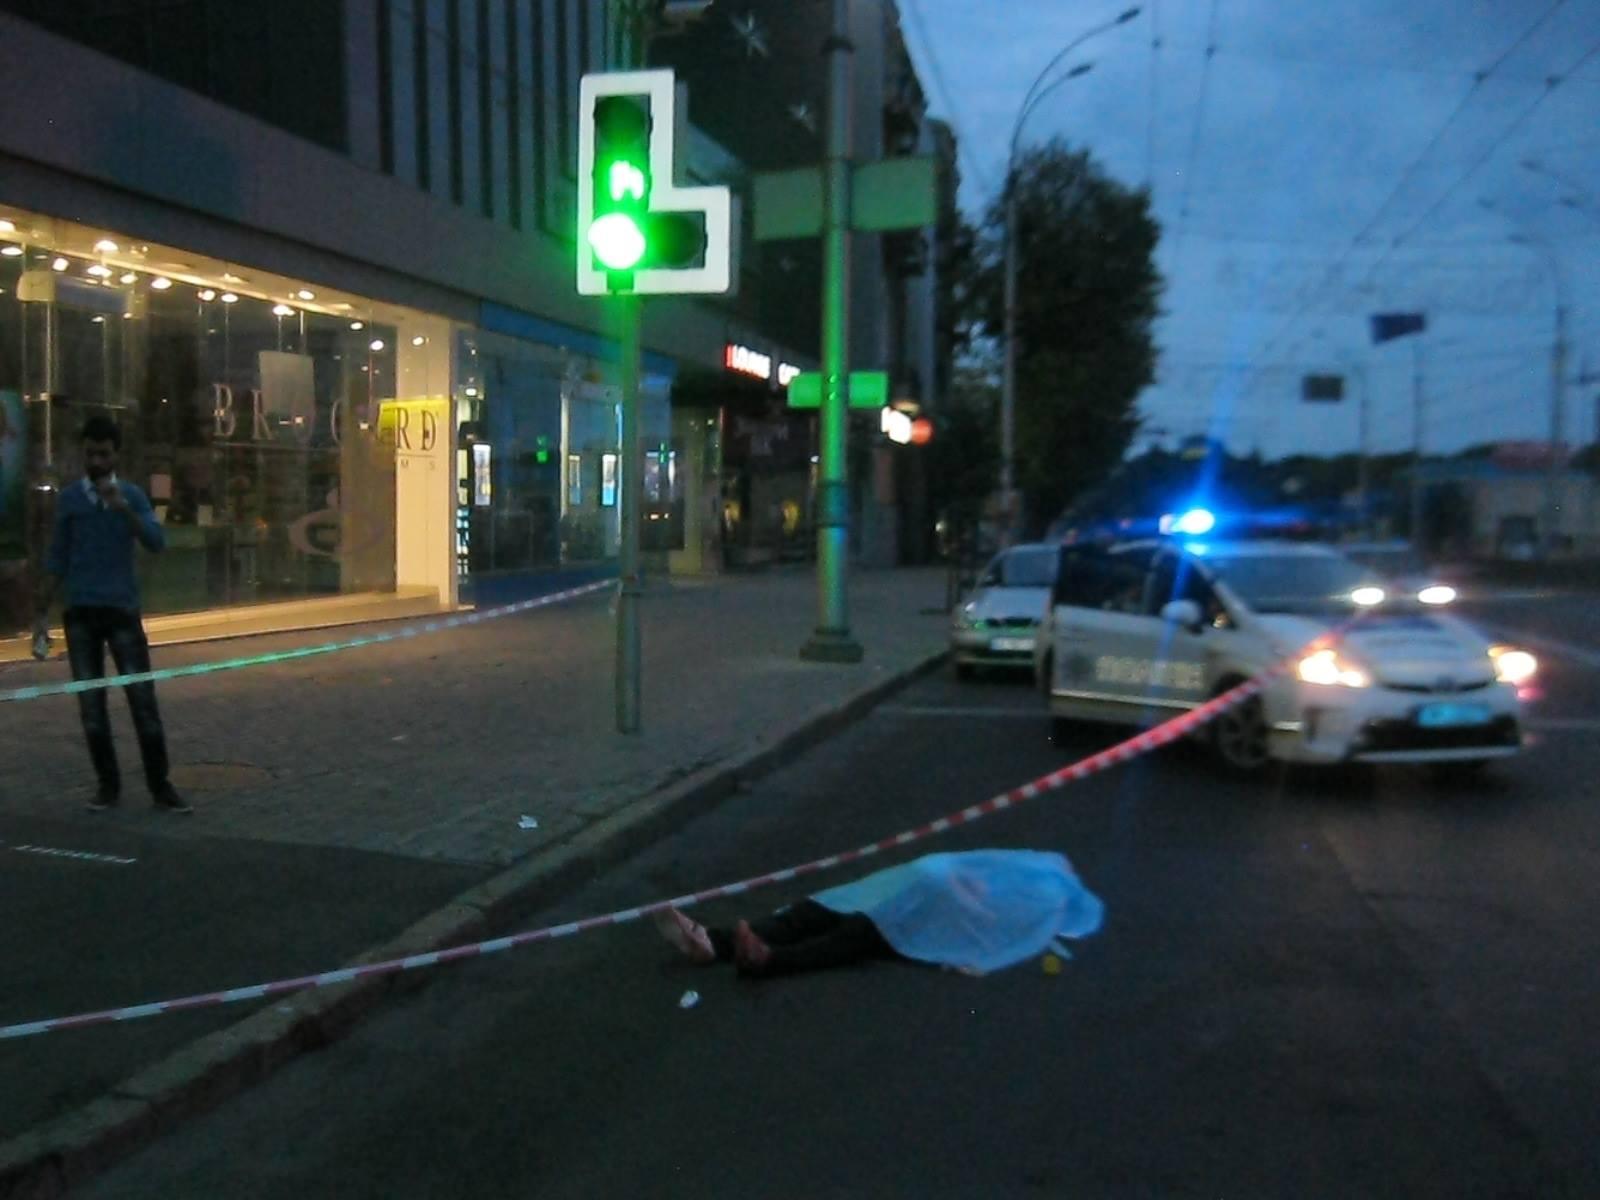 Улица залита кровью: вцентре Харькова убили студента-иностранца